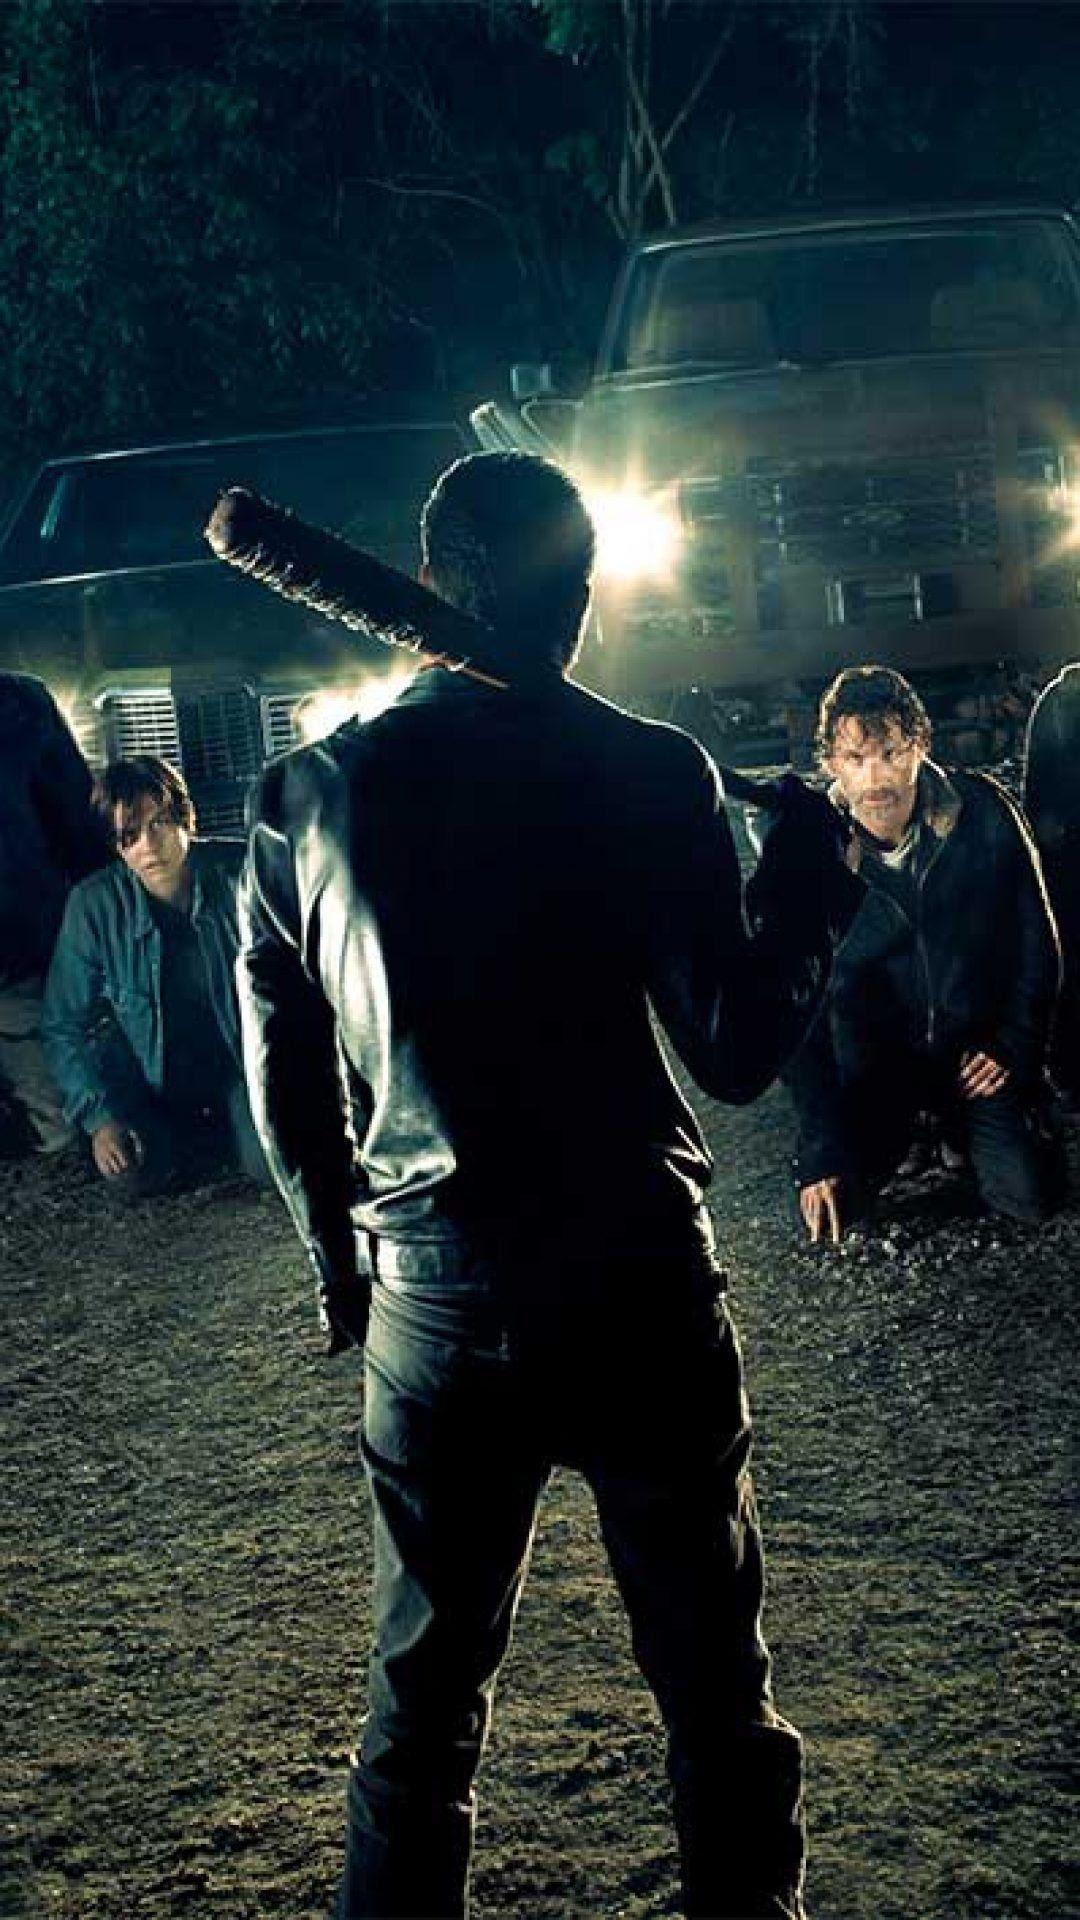 Walking Dead Iphone Wallpaper 76 Images